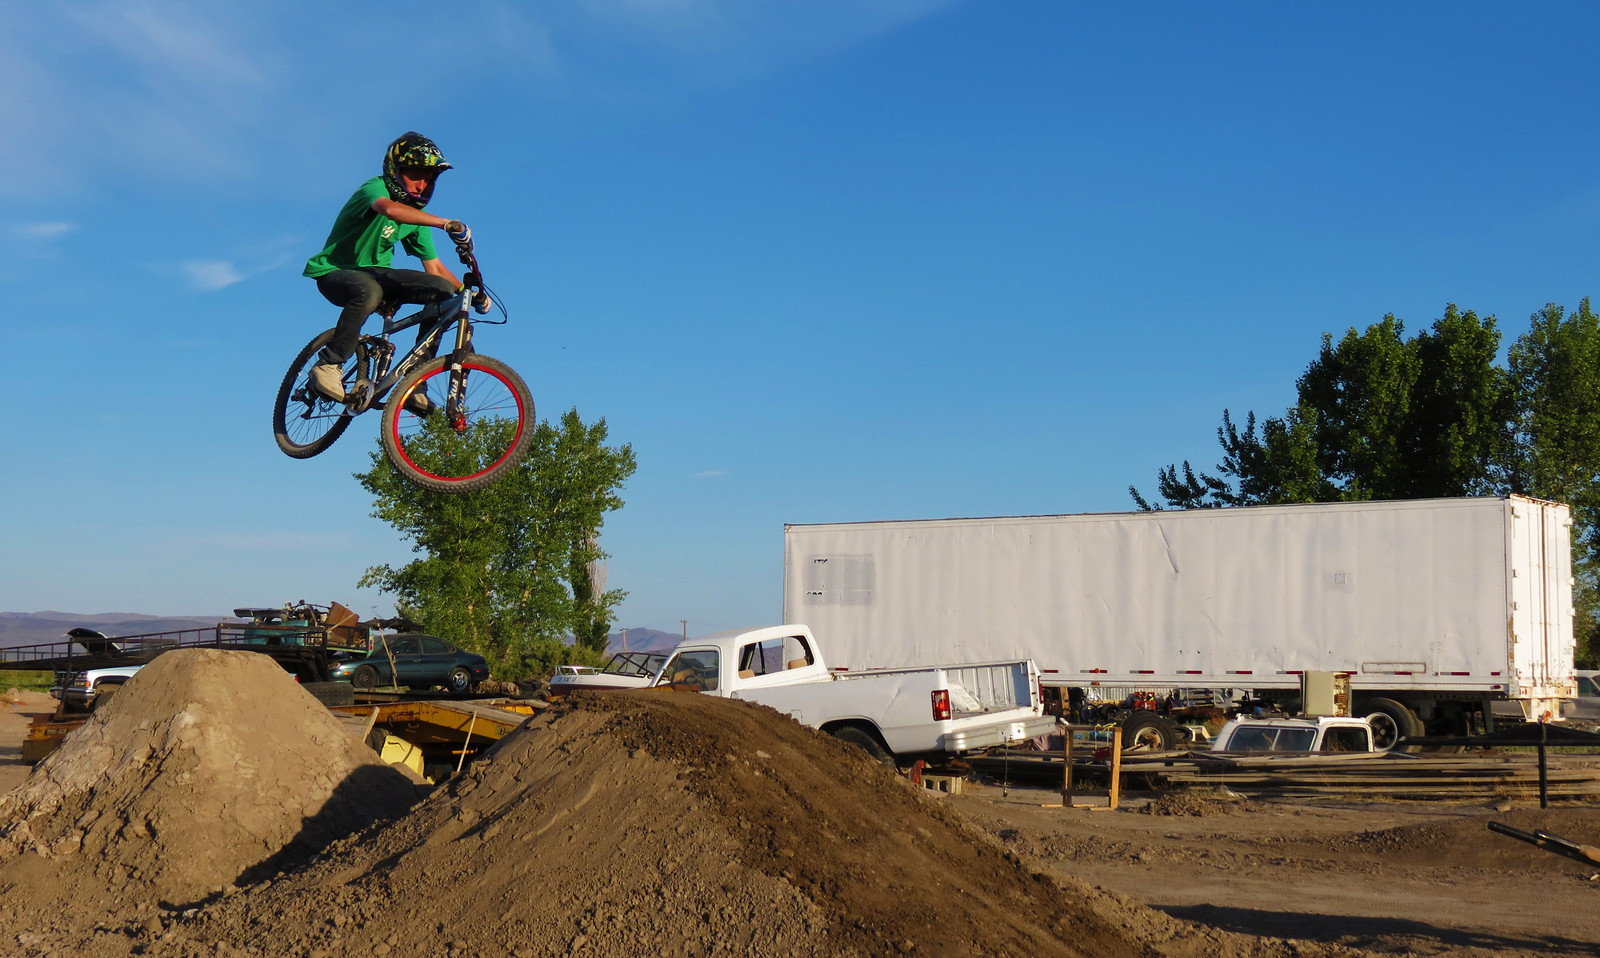 day 4 006 - Moosey - Mountain Biking Pictures - Vital MTB